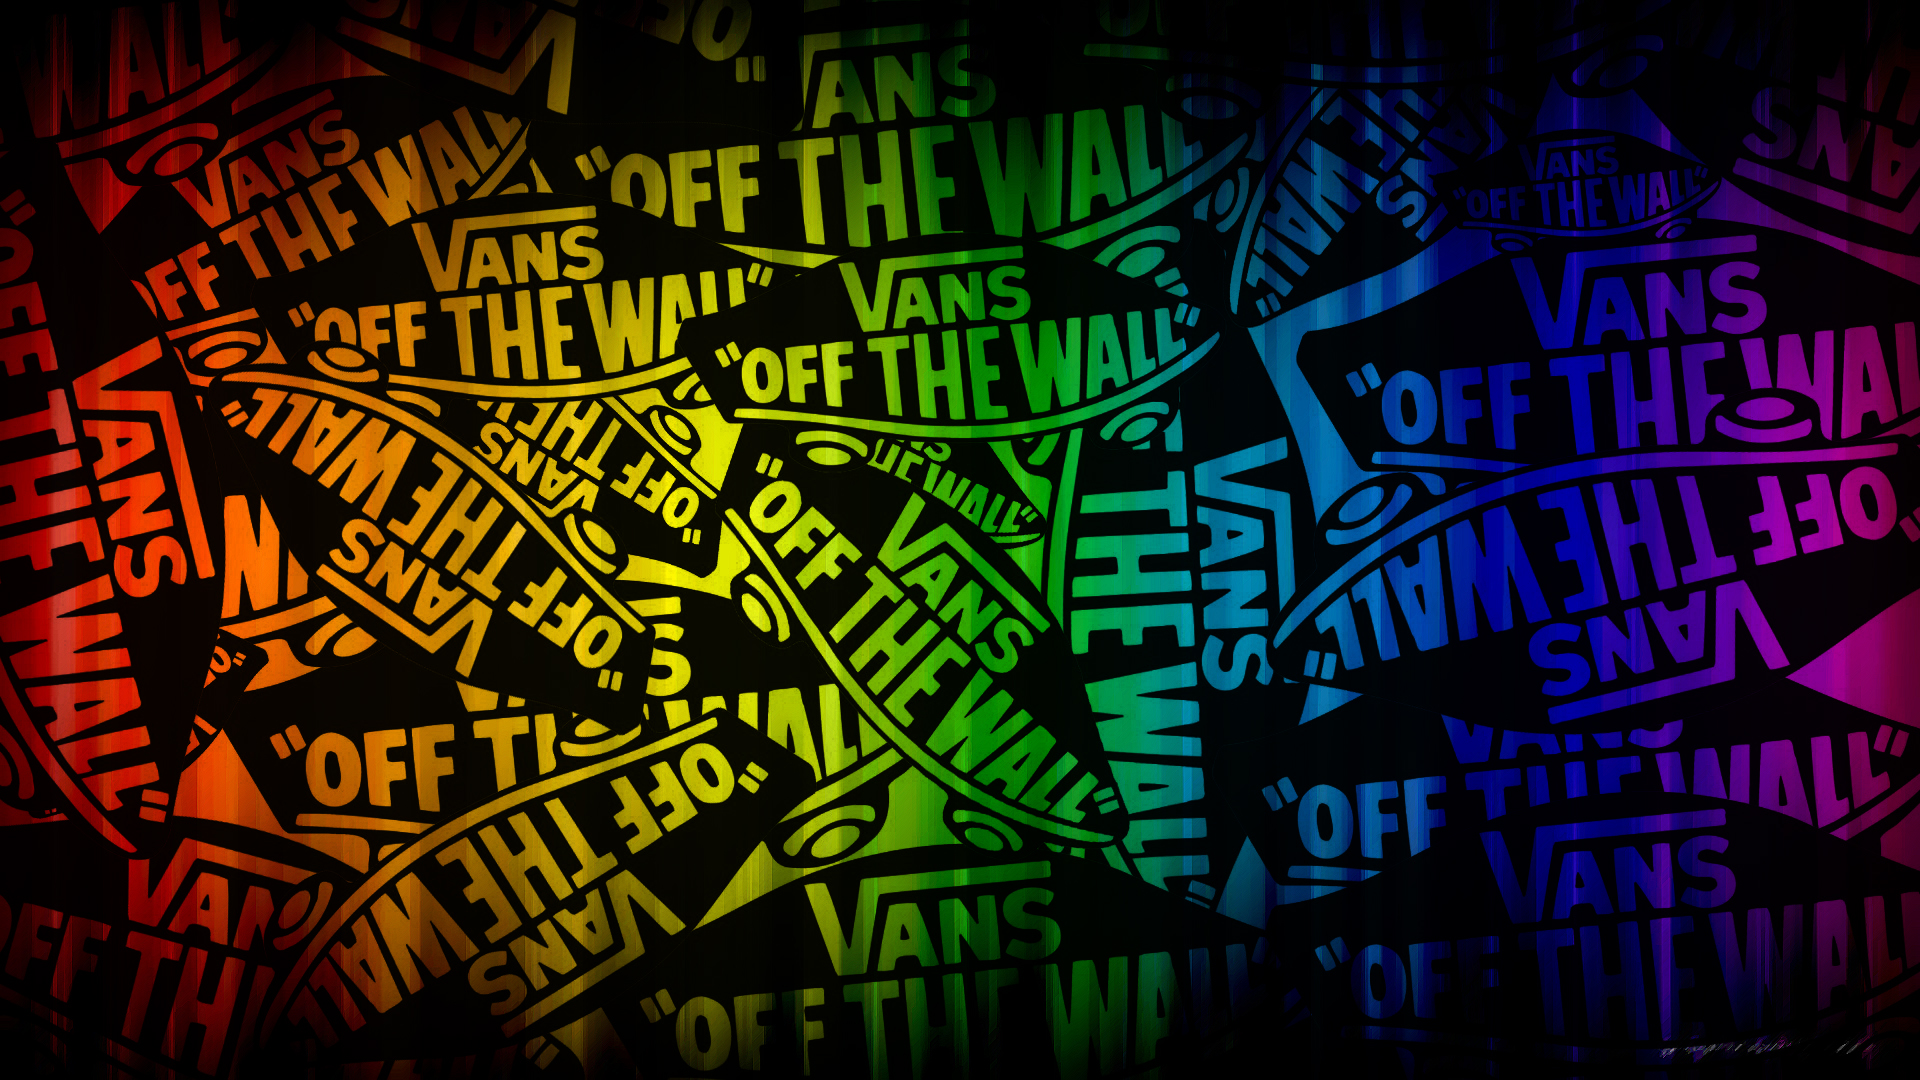 Vans Off the Wall by ceejaydejesus 1920x1080